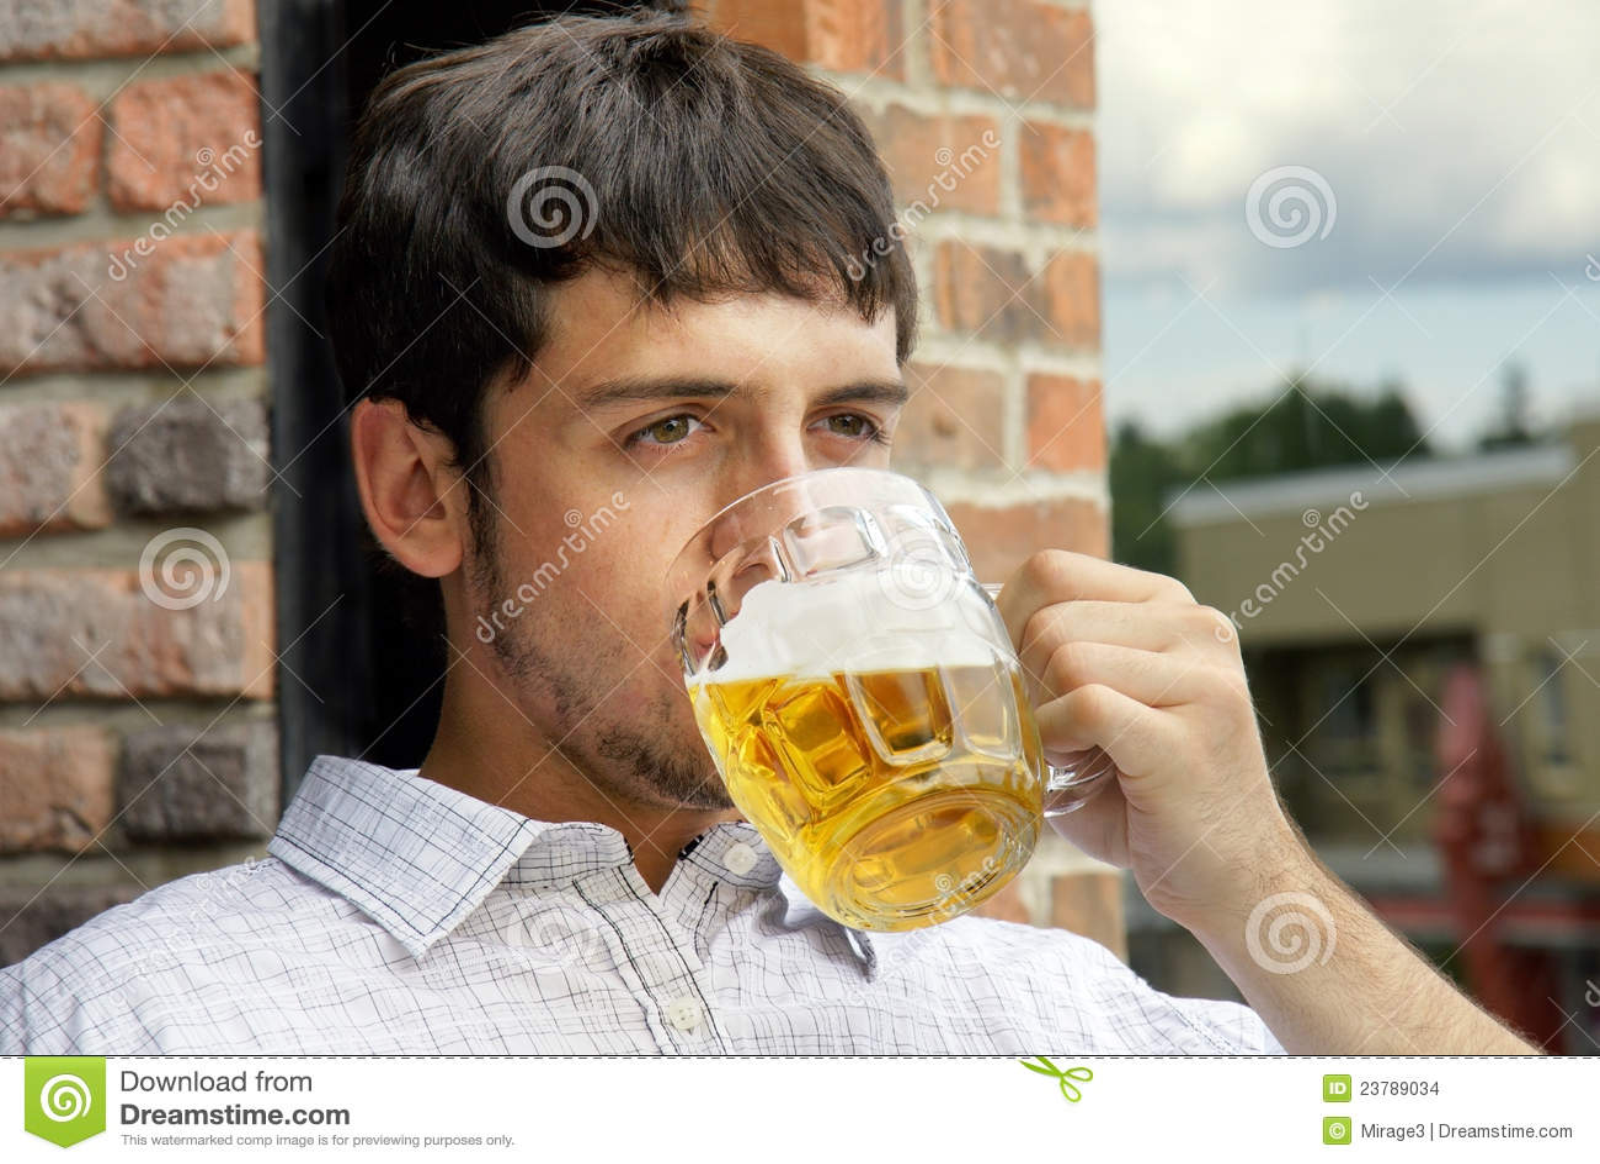 Guy Drinking Beer Sad